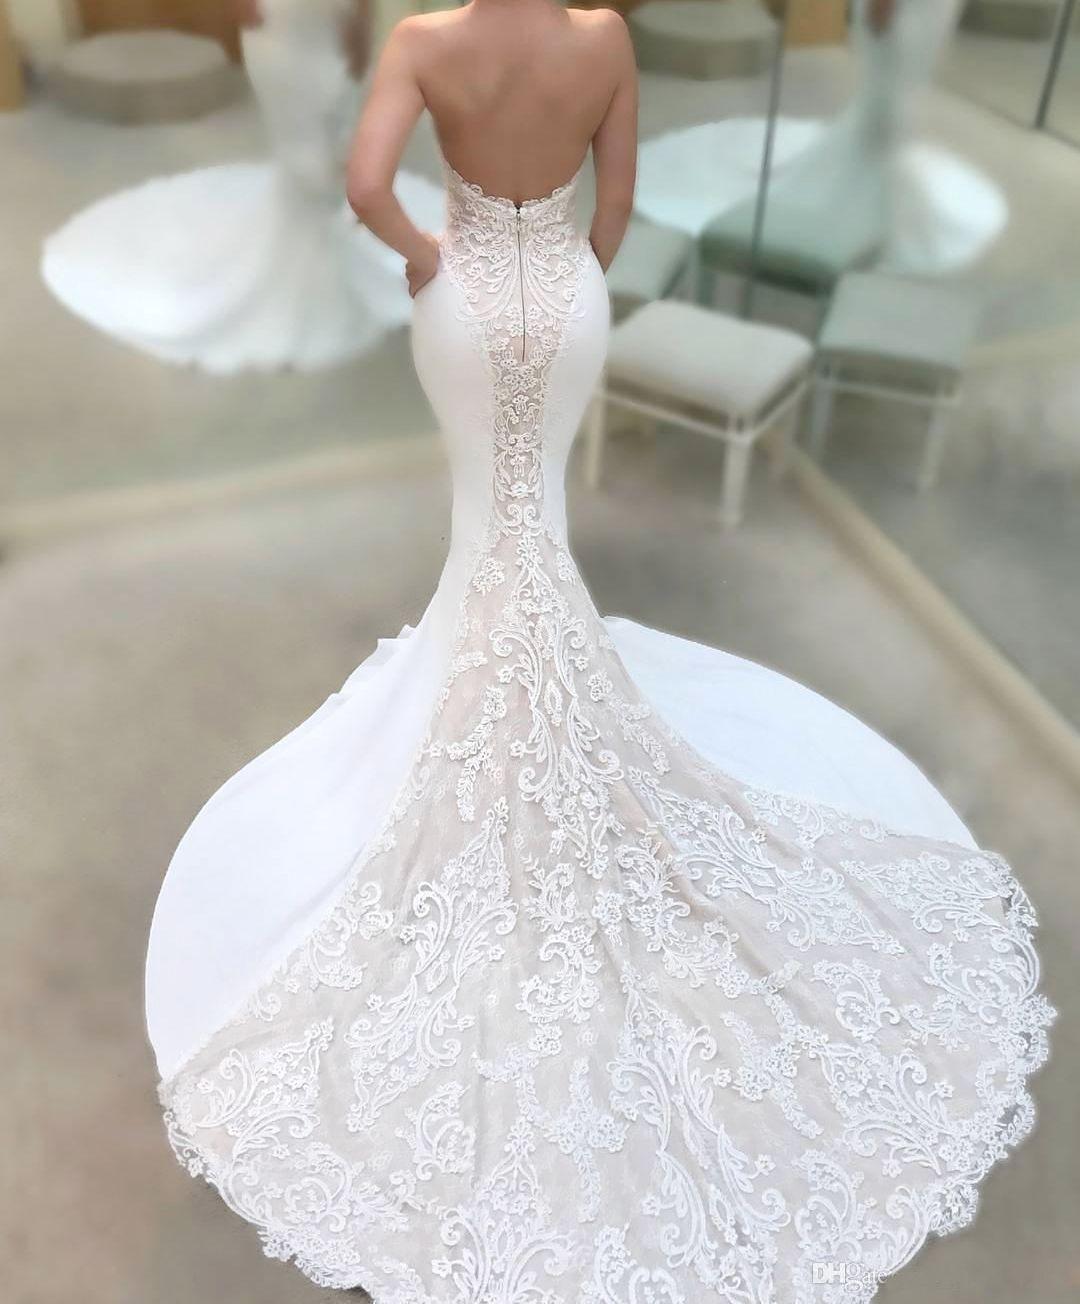 ZYLLGF Sexy Sweetheart Bodice Wedding Dresses Mermaid Court Train Open Back Weddings Bridal Gowns Dress Appliques Lace Vestido De Novia